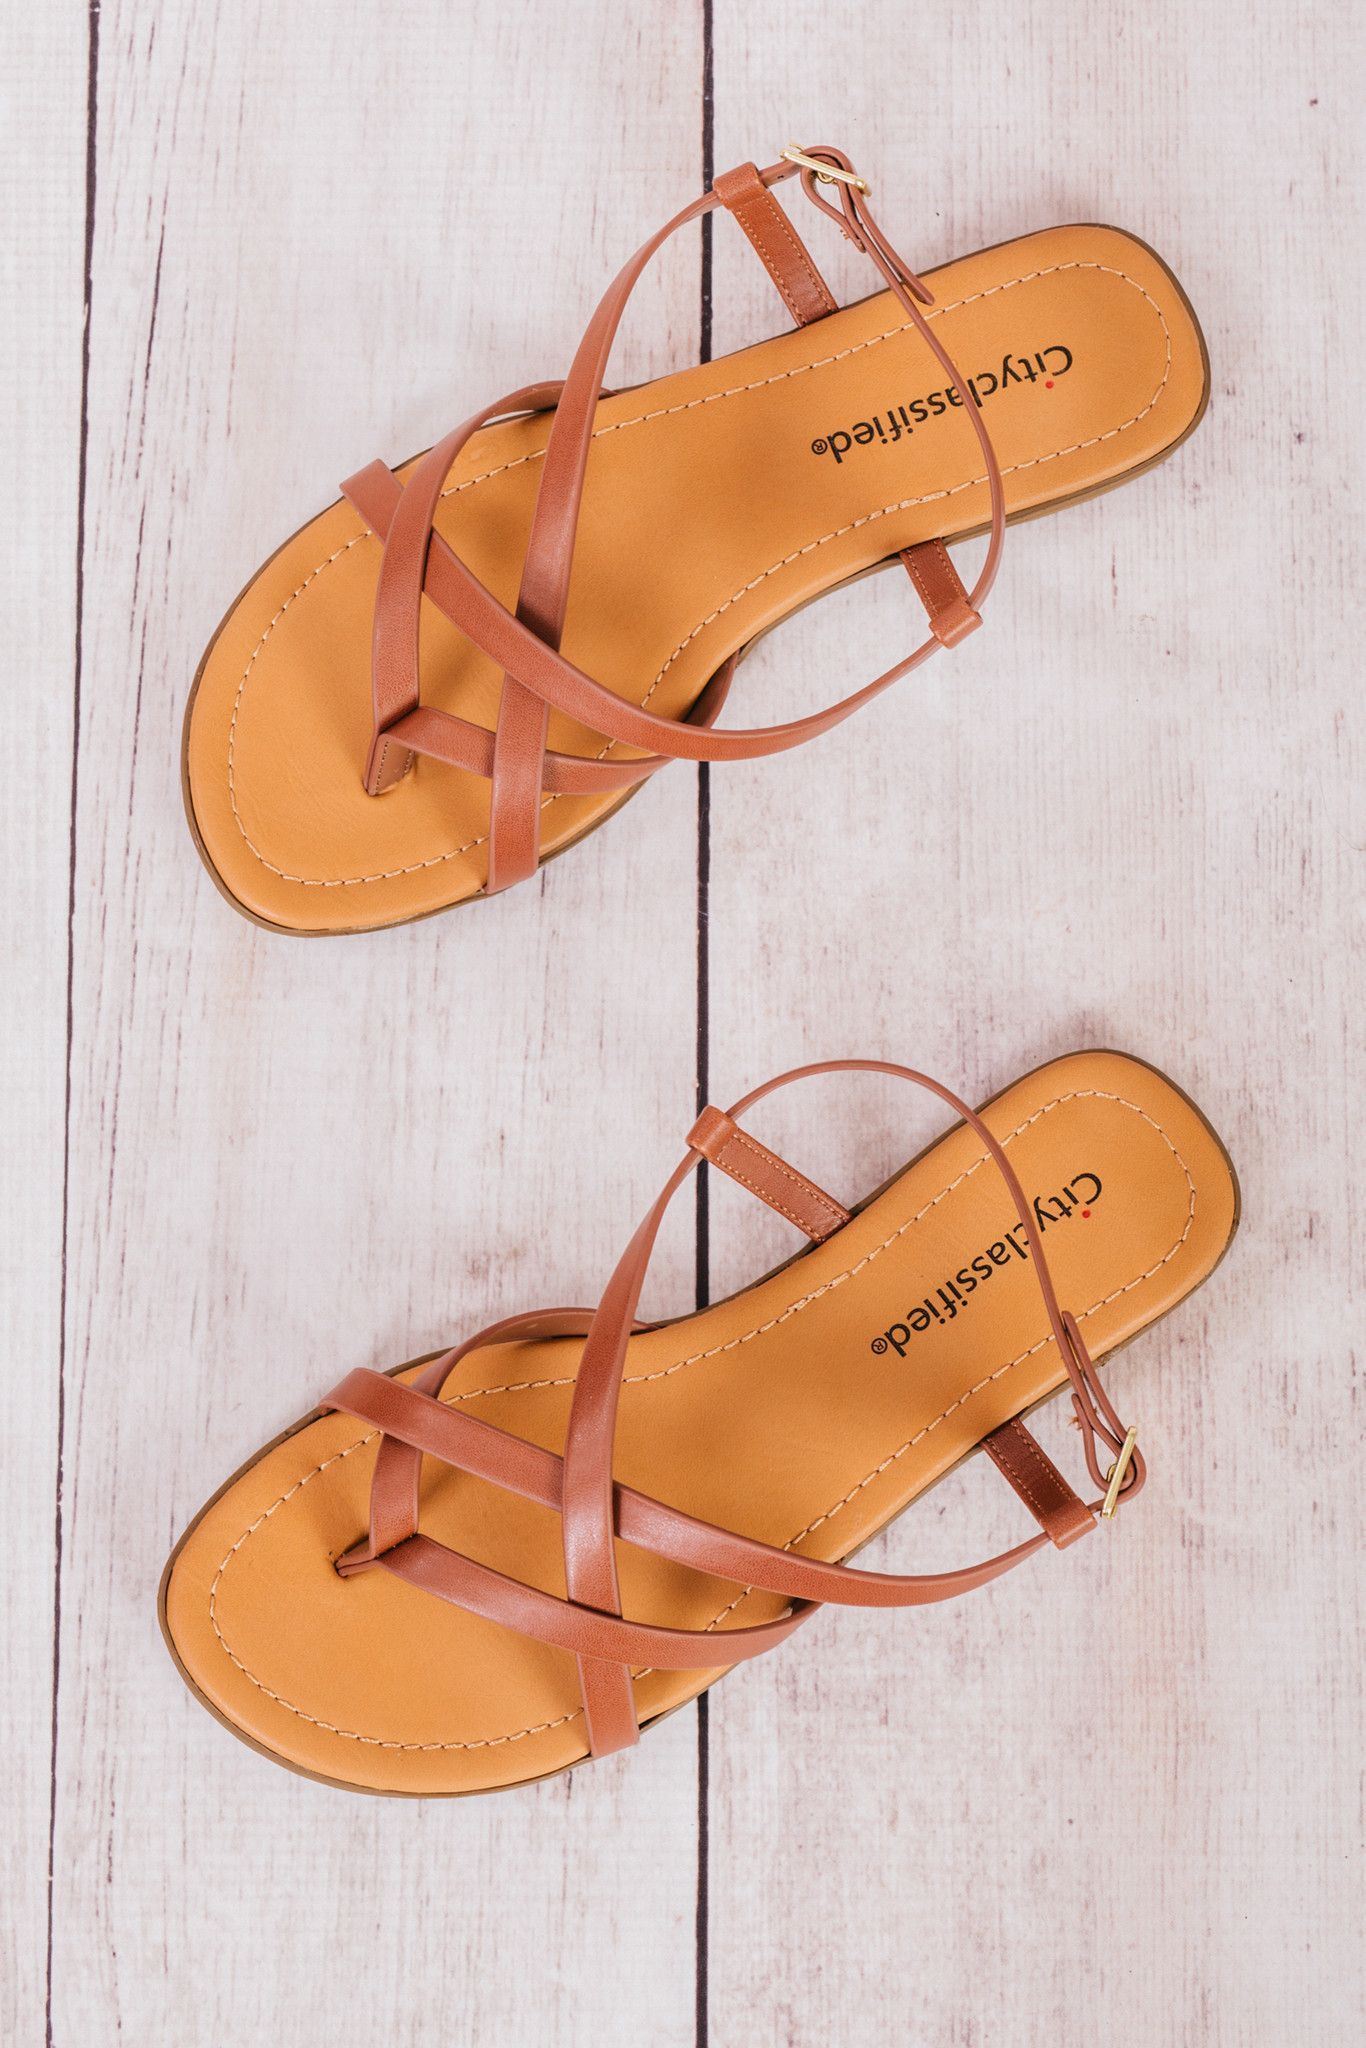 712bdd33720483 Spica Sandals